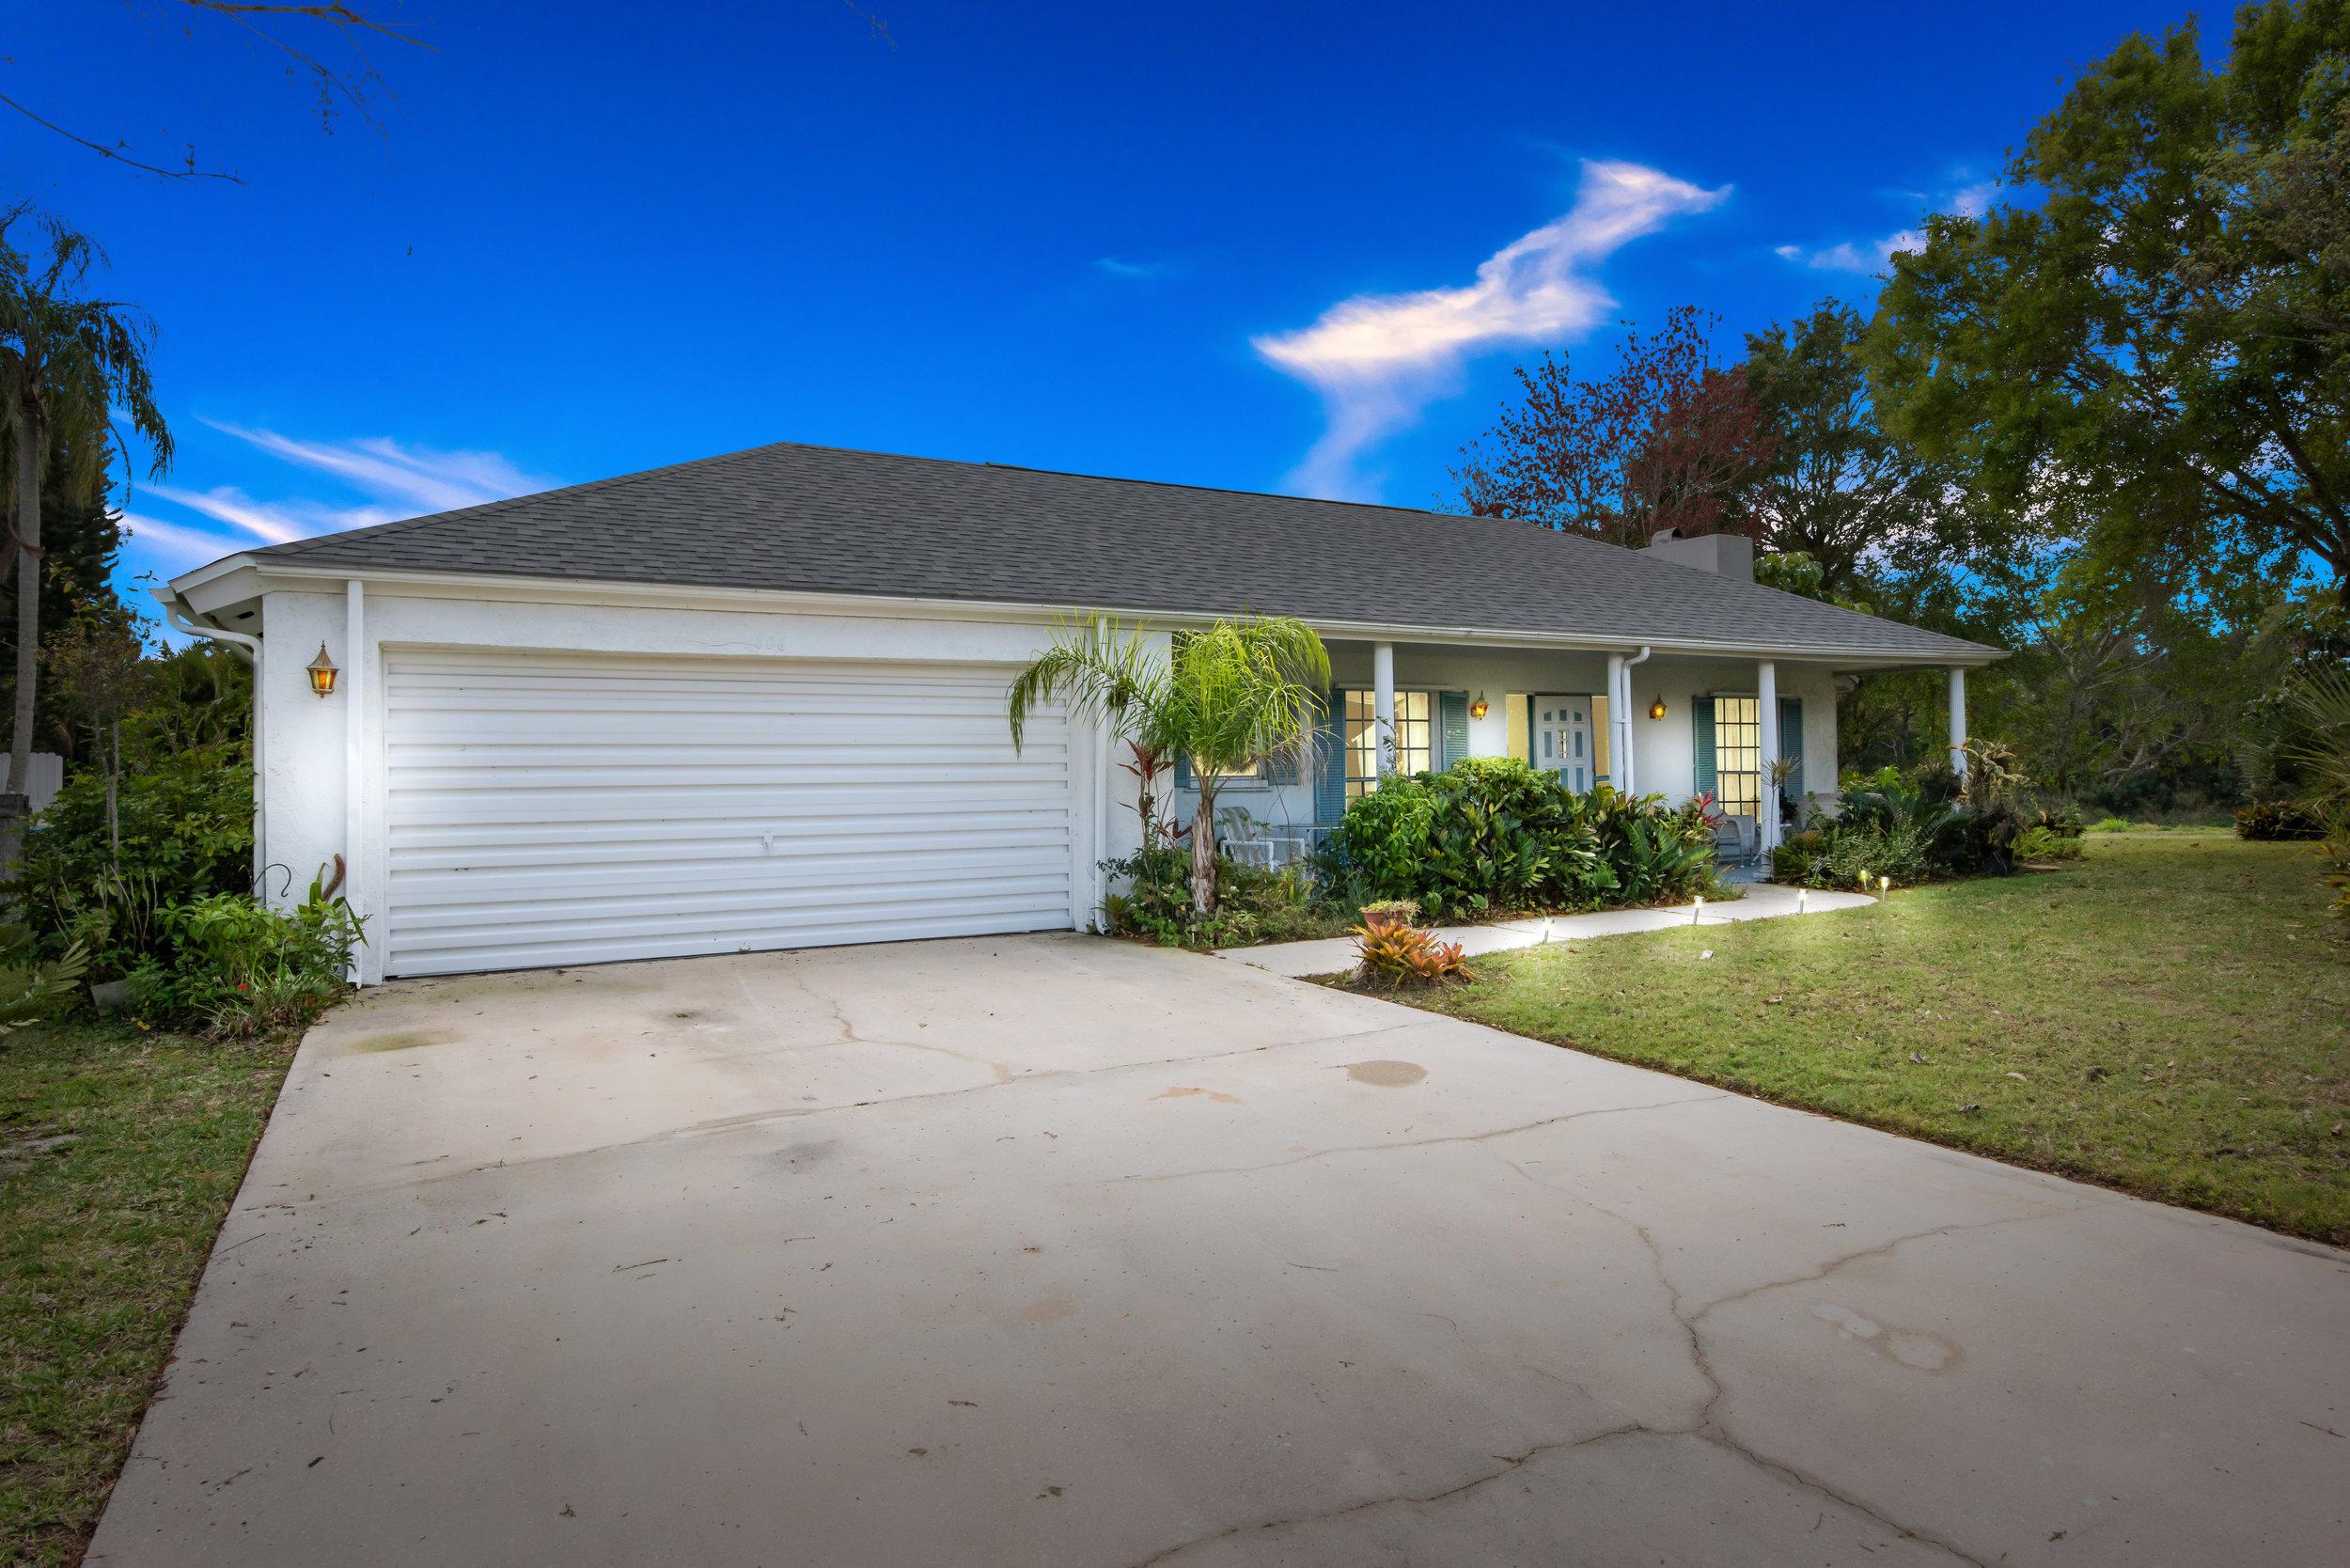 606 Dunbarton Circle NE Palm Bay, FL 32905. For Sale by Brent Burns.